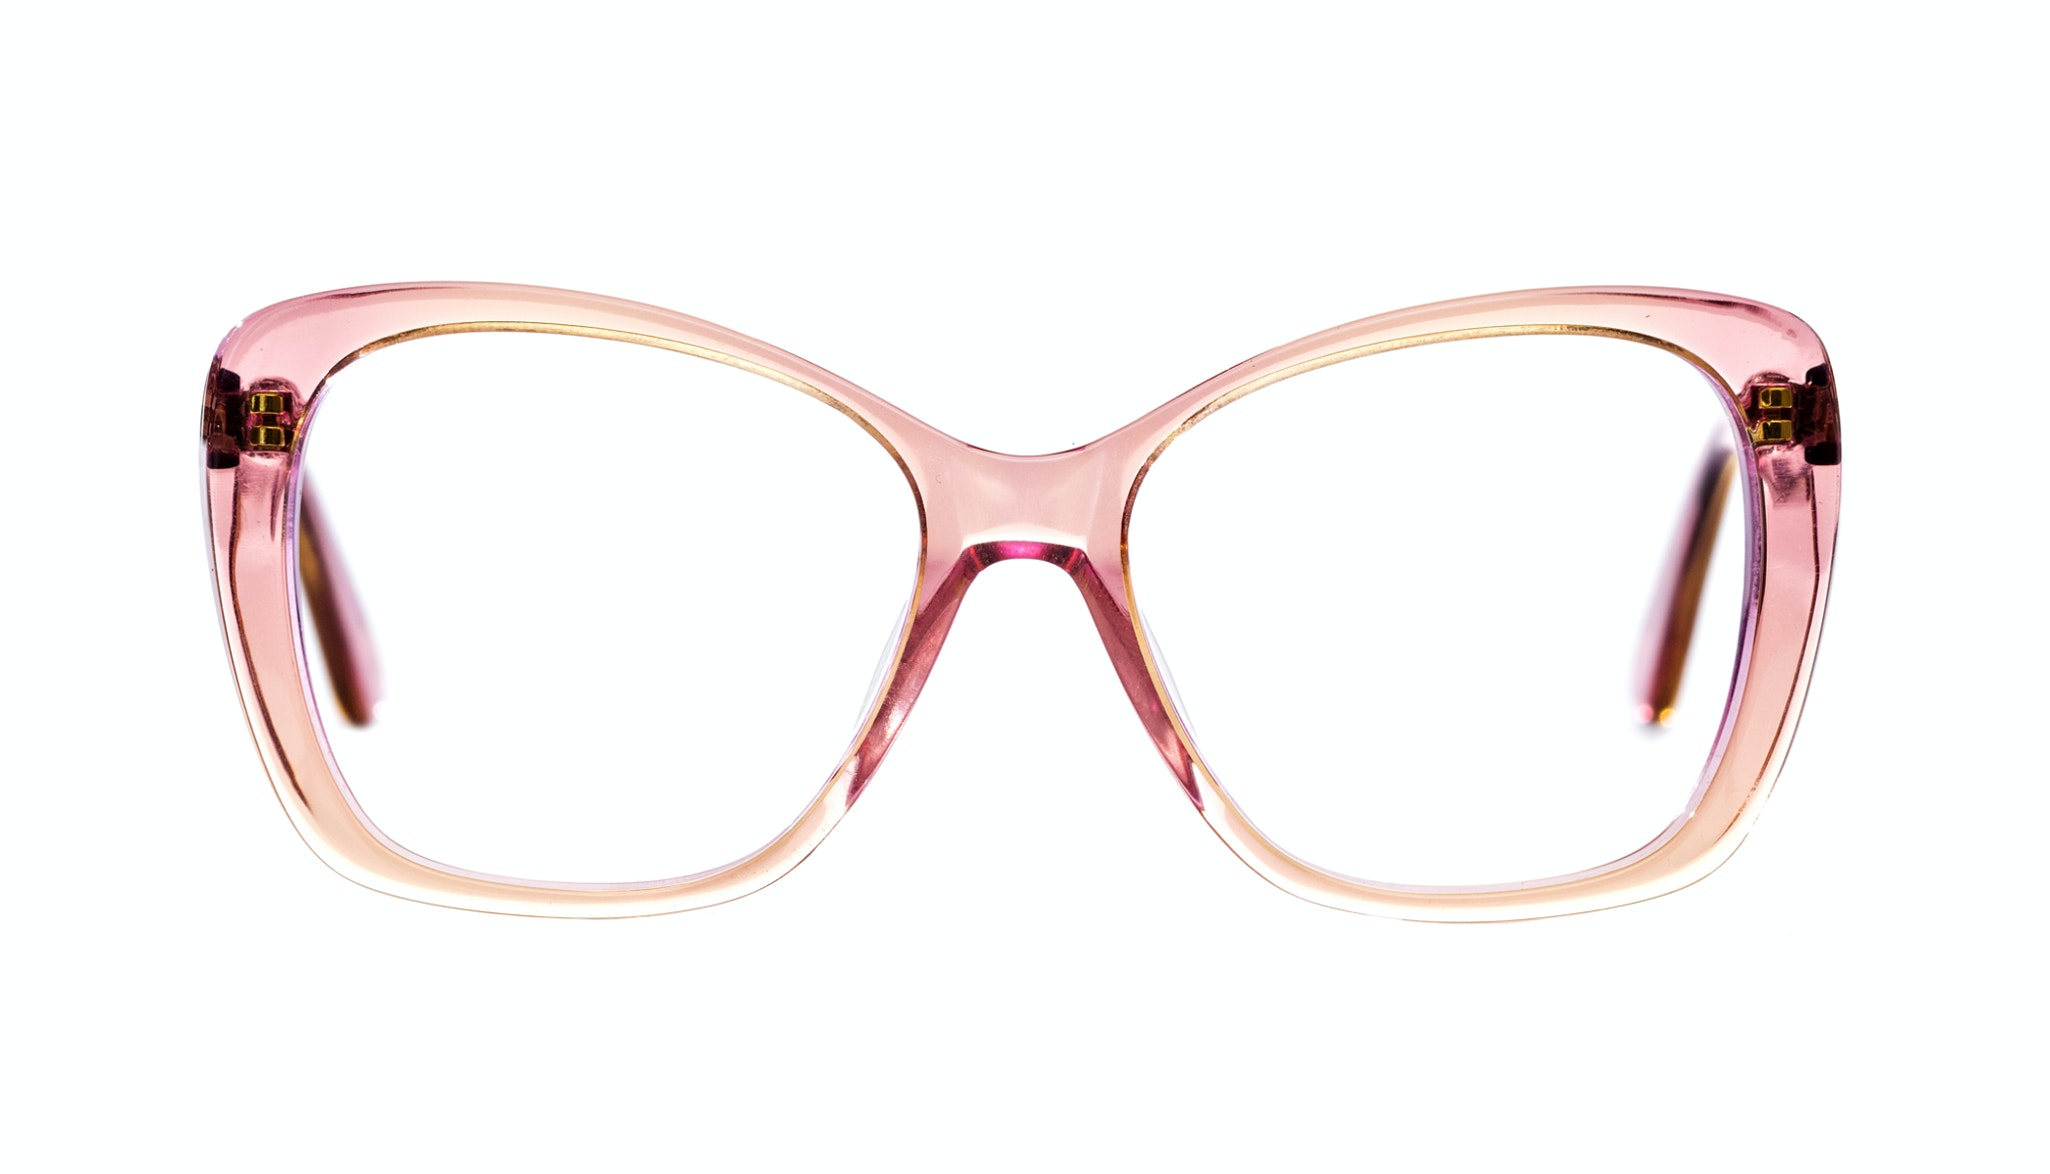 Affordable Fashion Glasses Cat Eye Square Eyeglasses Women Charm Pink Haze